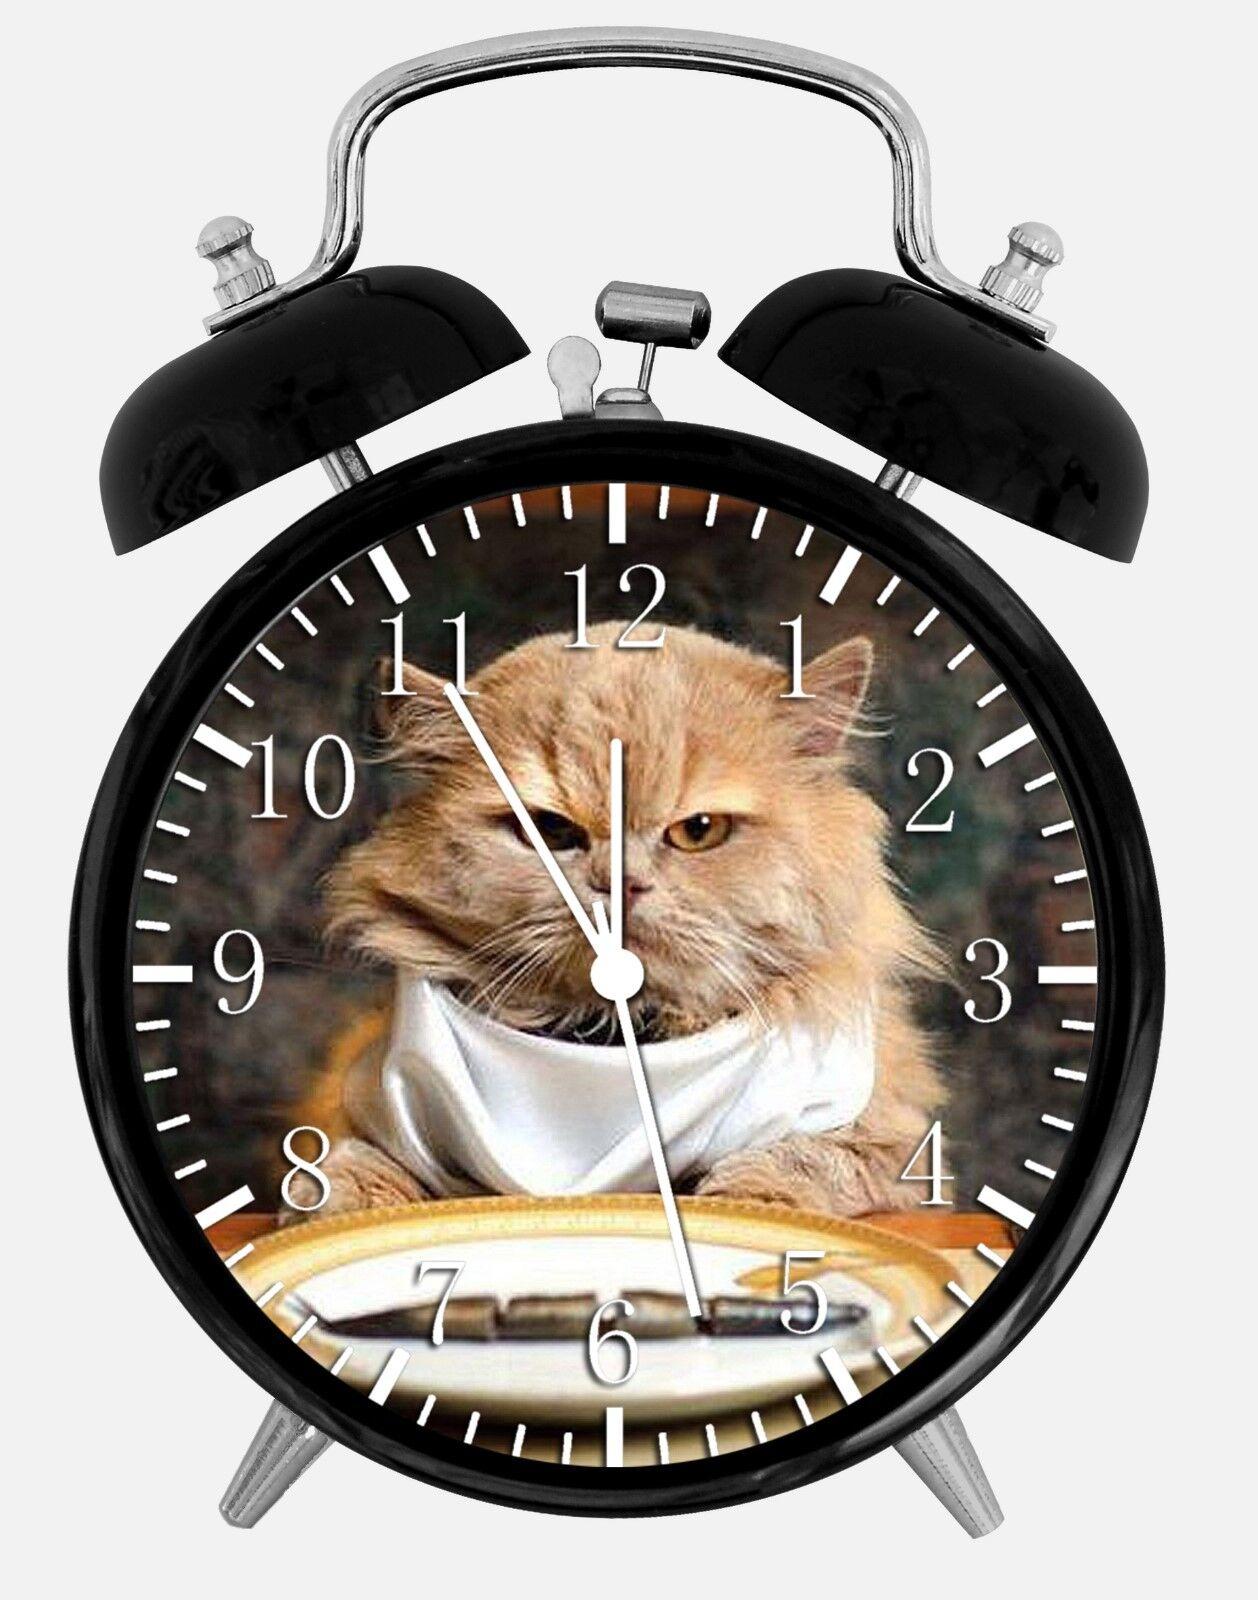 "Cute Funny Cat Alarm Desk Clock 3.75"" Room Office Decor E303 Nice For Gift"